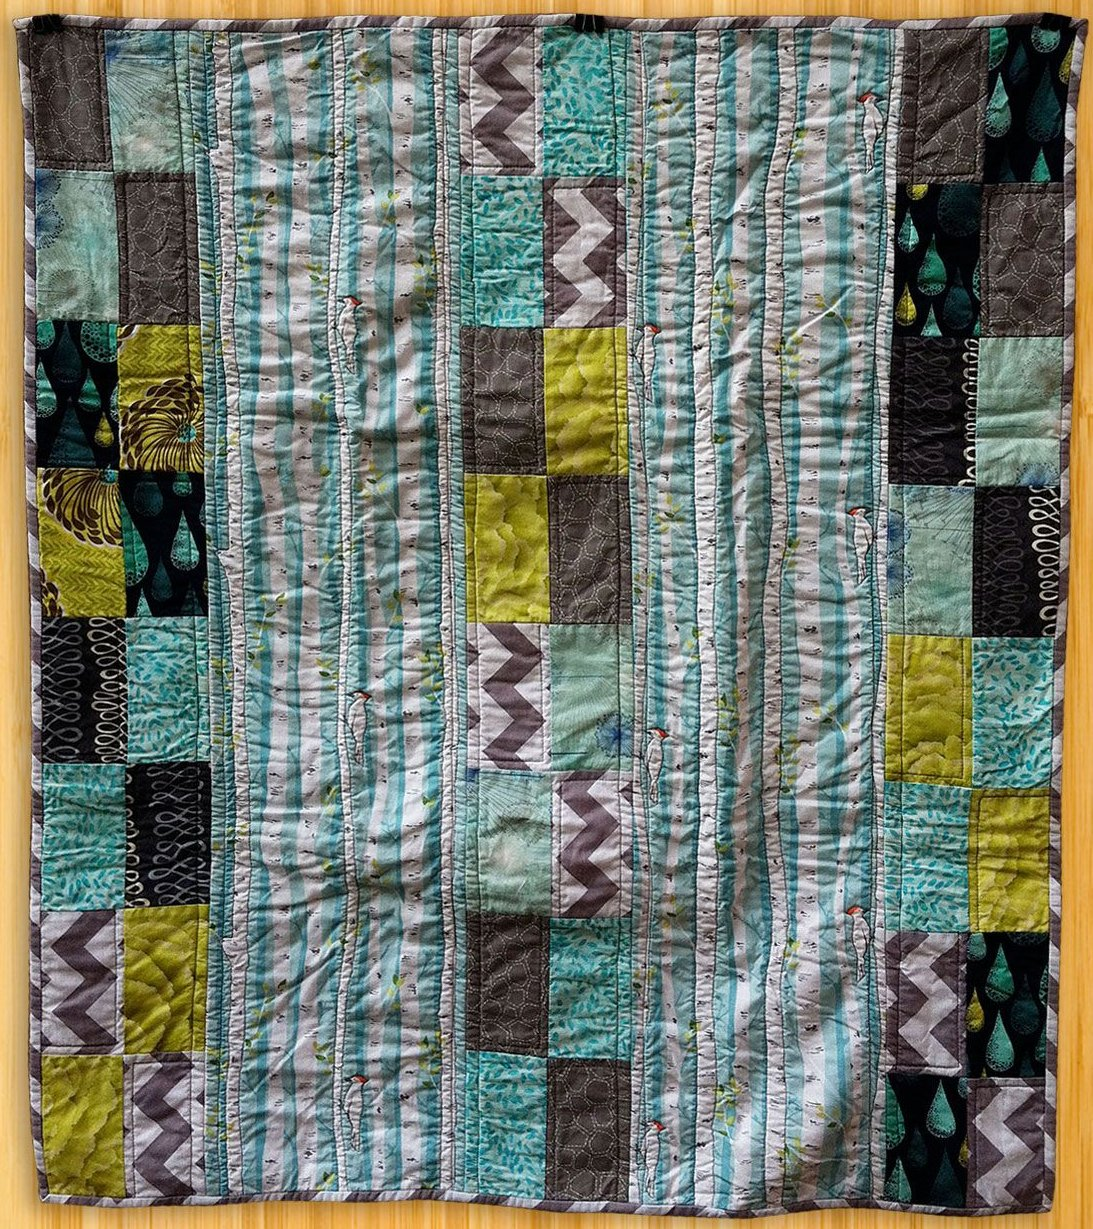 (Made Using Patty Sloniger Backyard Baby Fabric In Birch Forest)